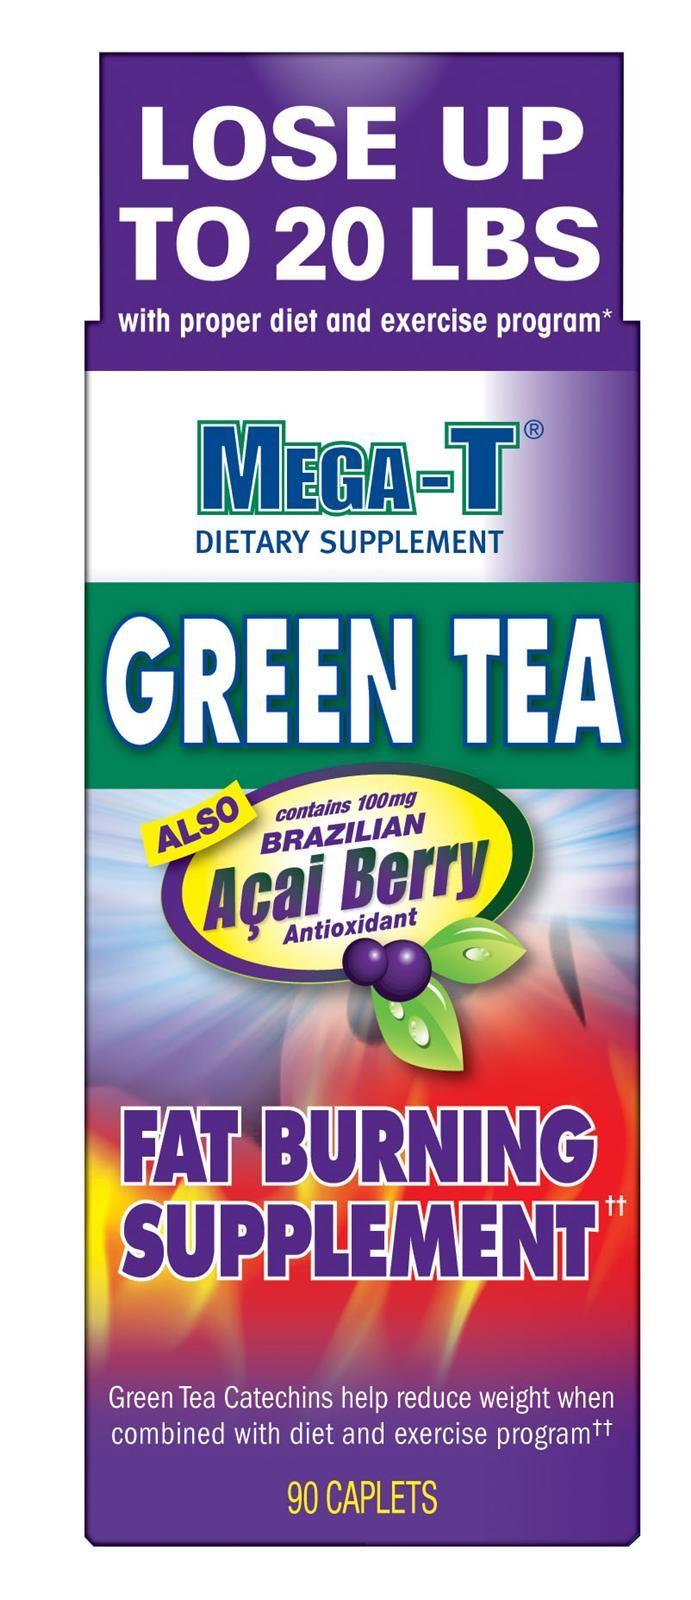 Natural healing for weight loss